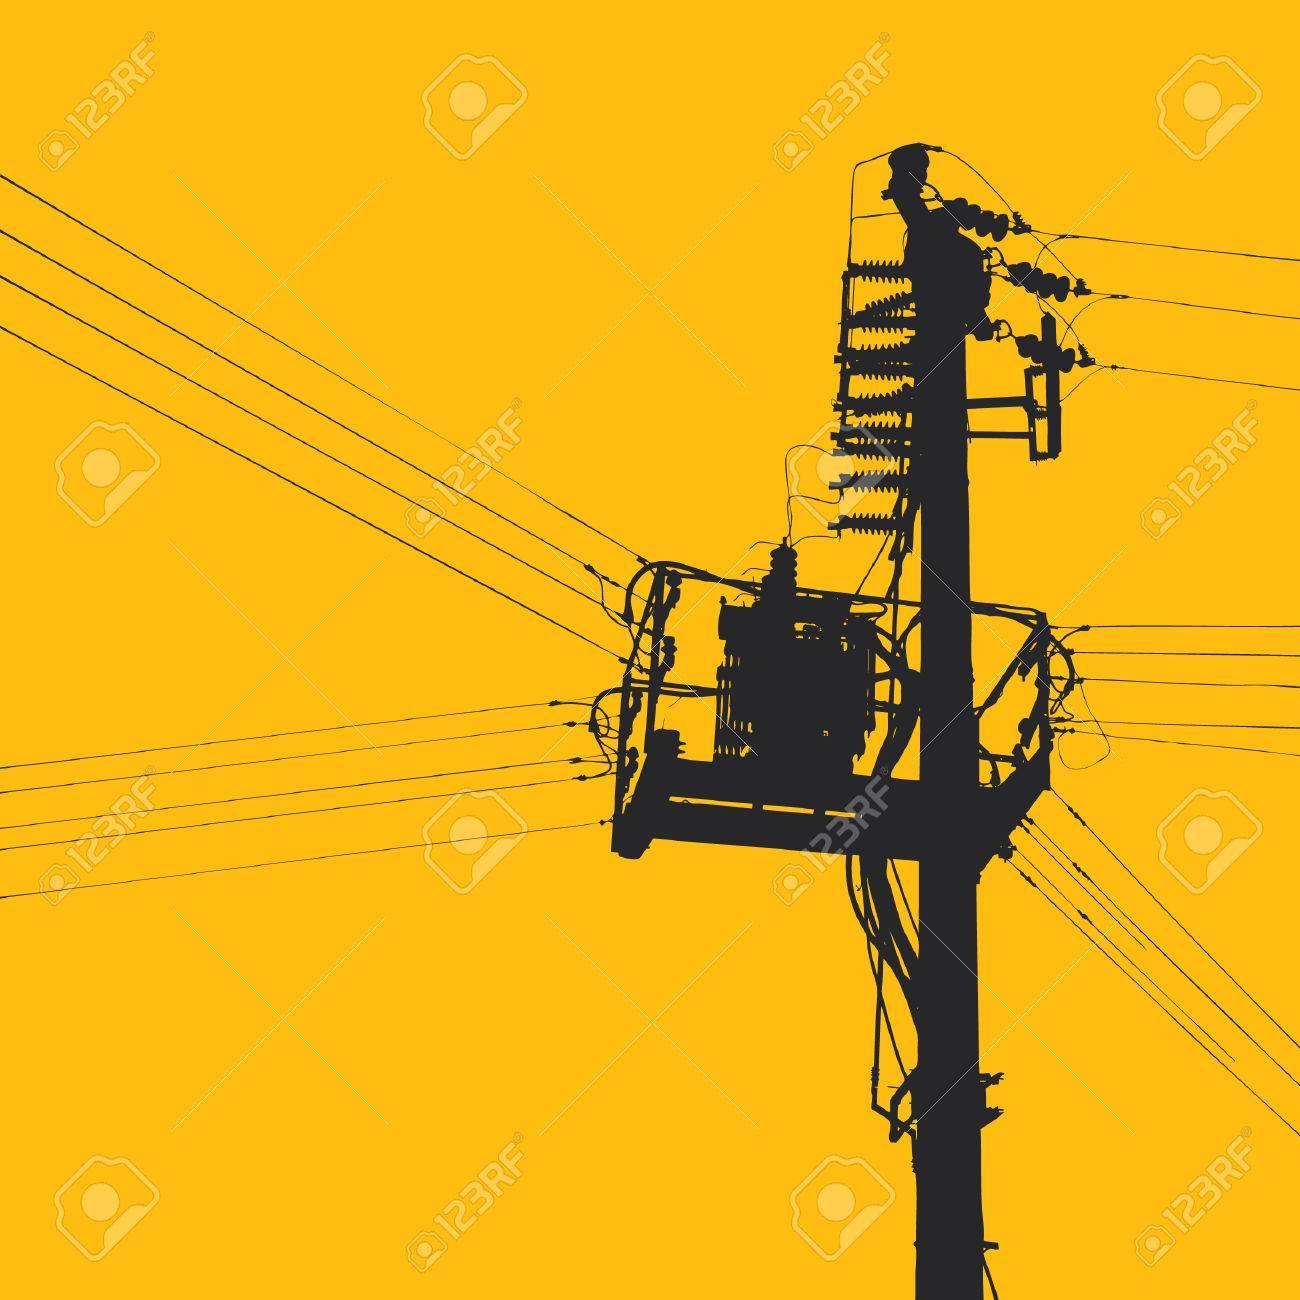 Clipart Electricity Pylon Vector Electricity Pylon